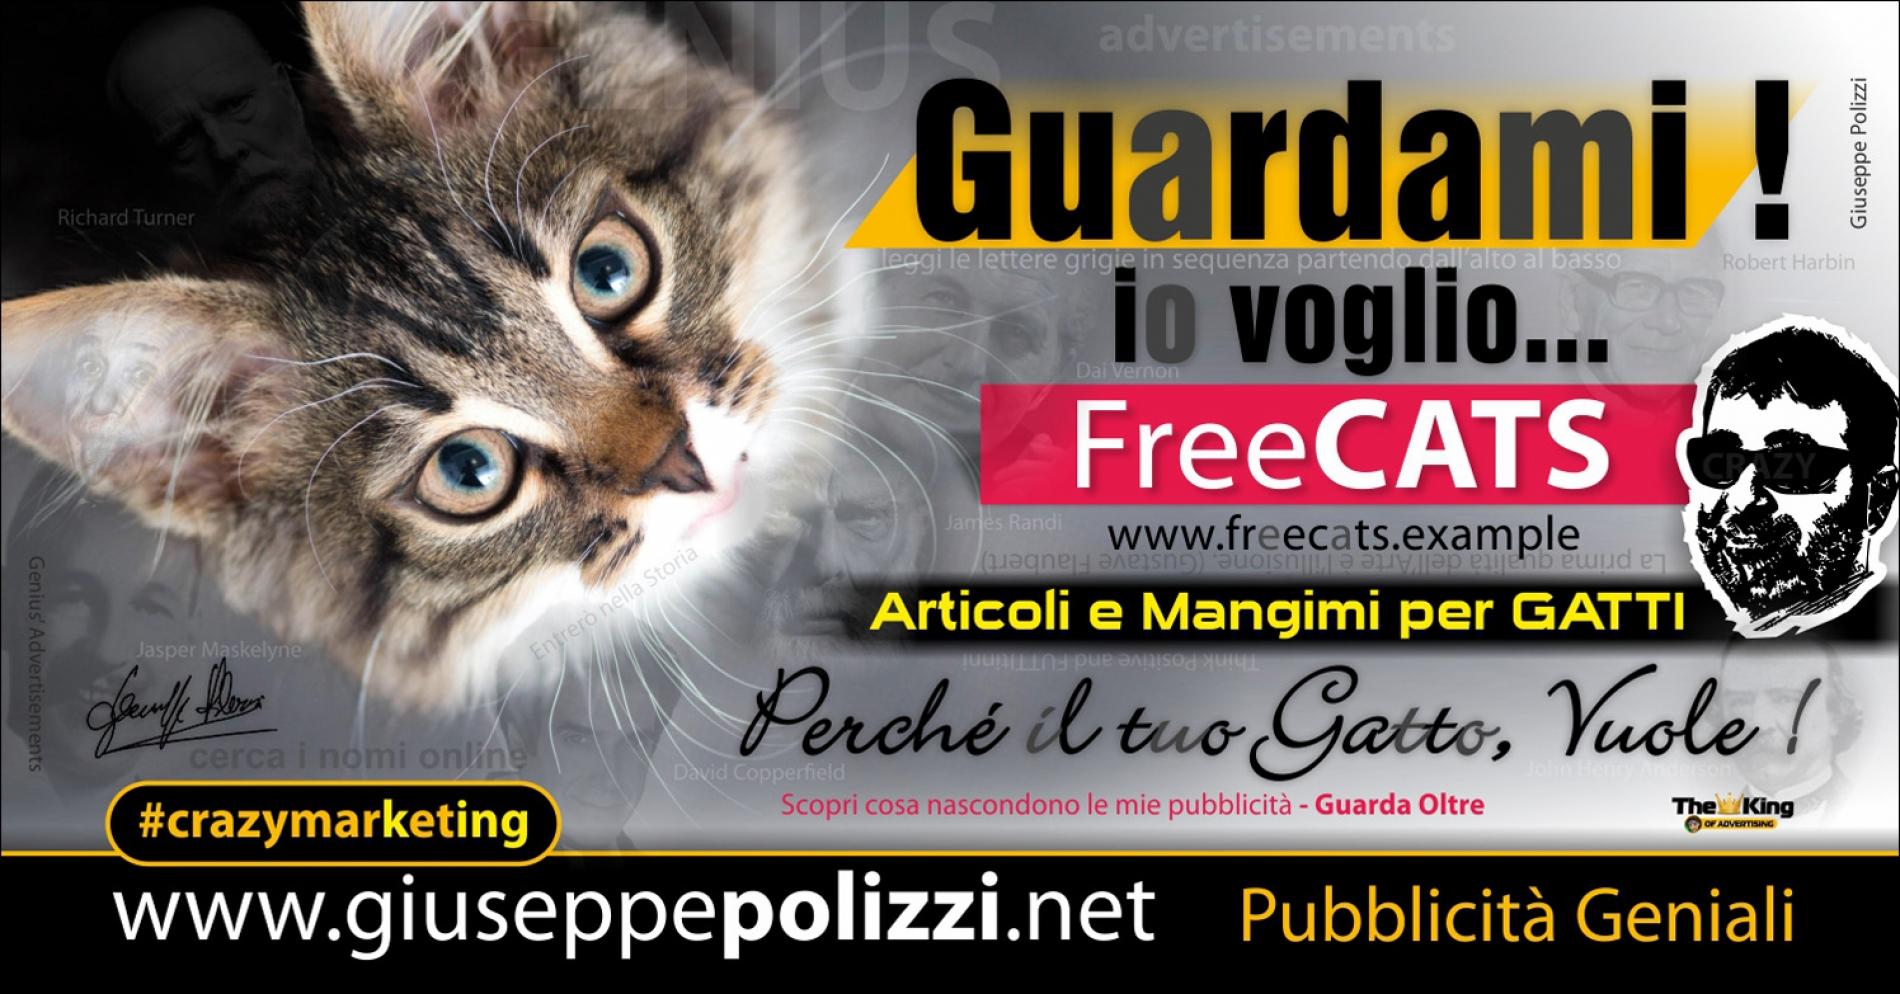 giuseppe Polizzi Guardami crazymarketing pubblicita geniali